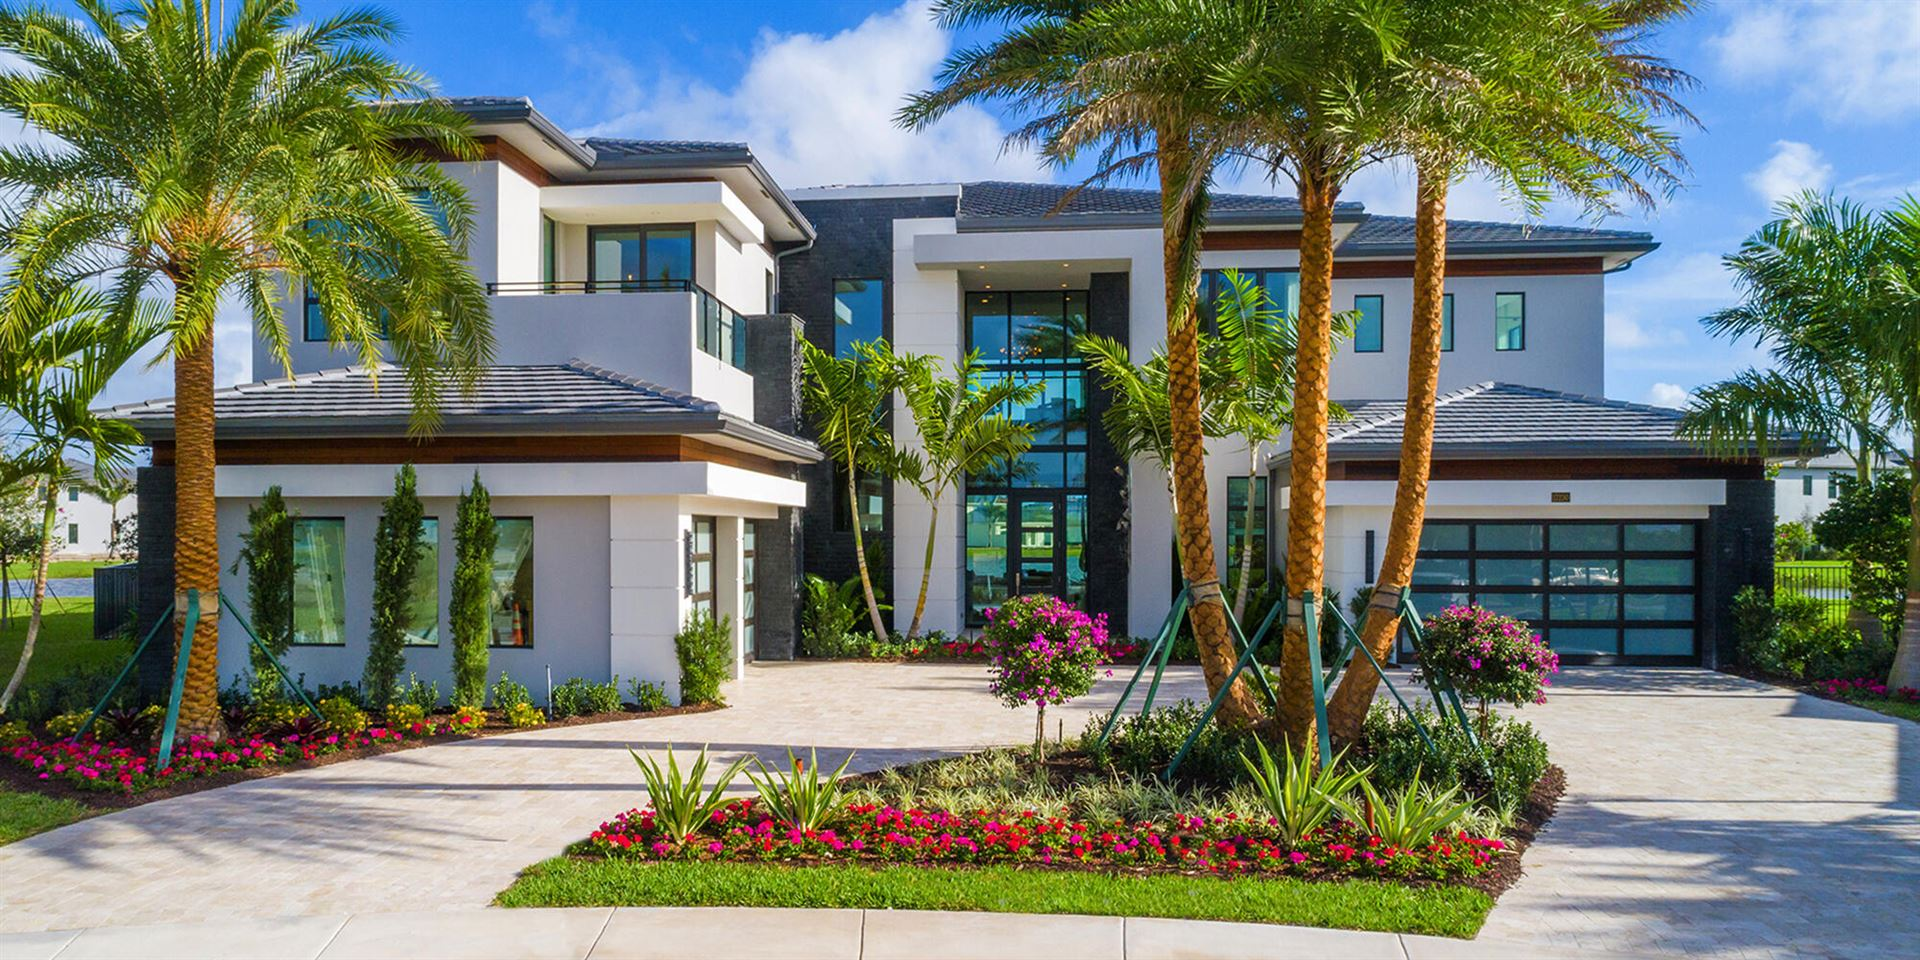 17230 Brulee Breeze Way, Boca Raton, FL 33496 - MLS#: RX-10744271